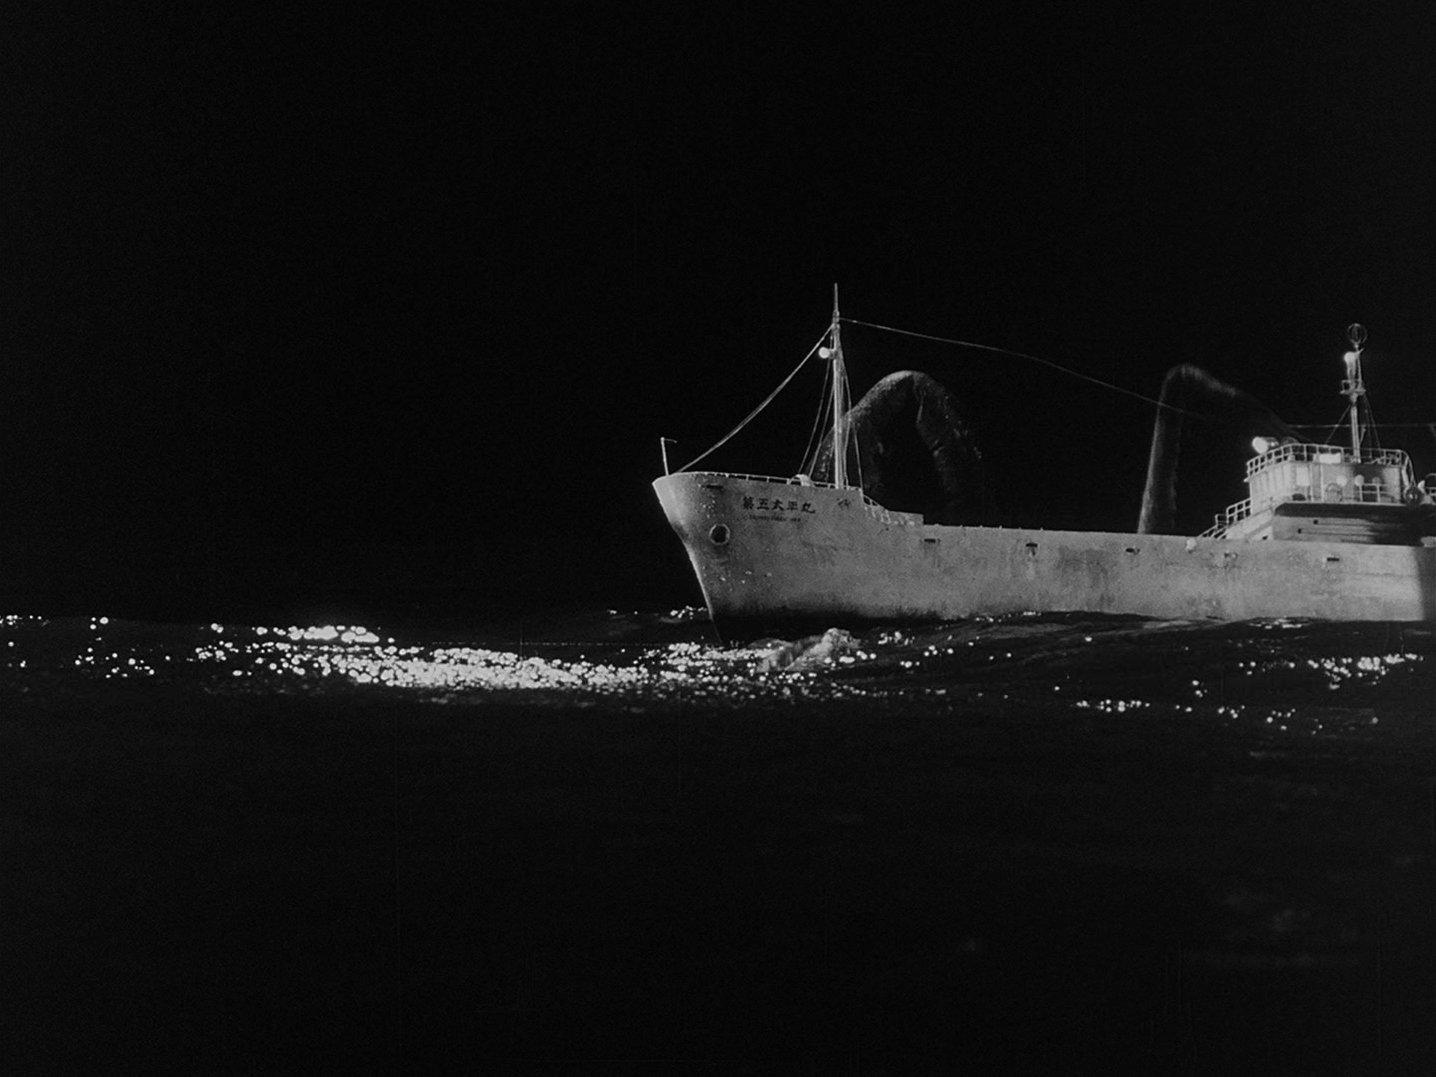 『GMK』漁船の名前